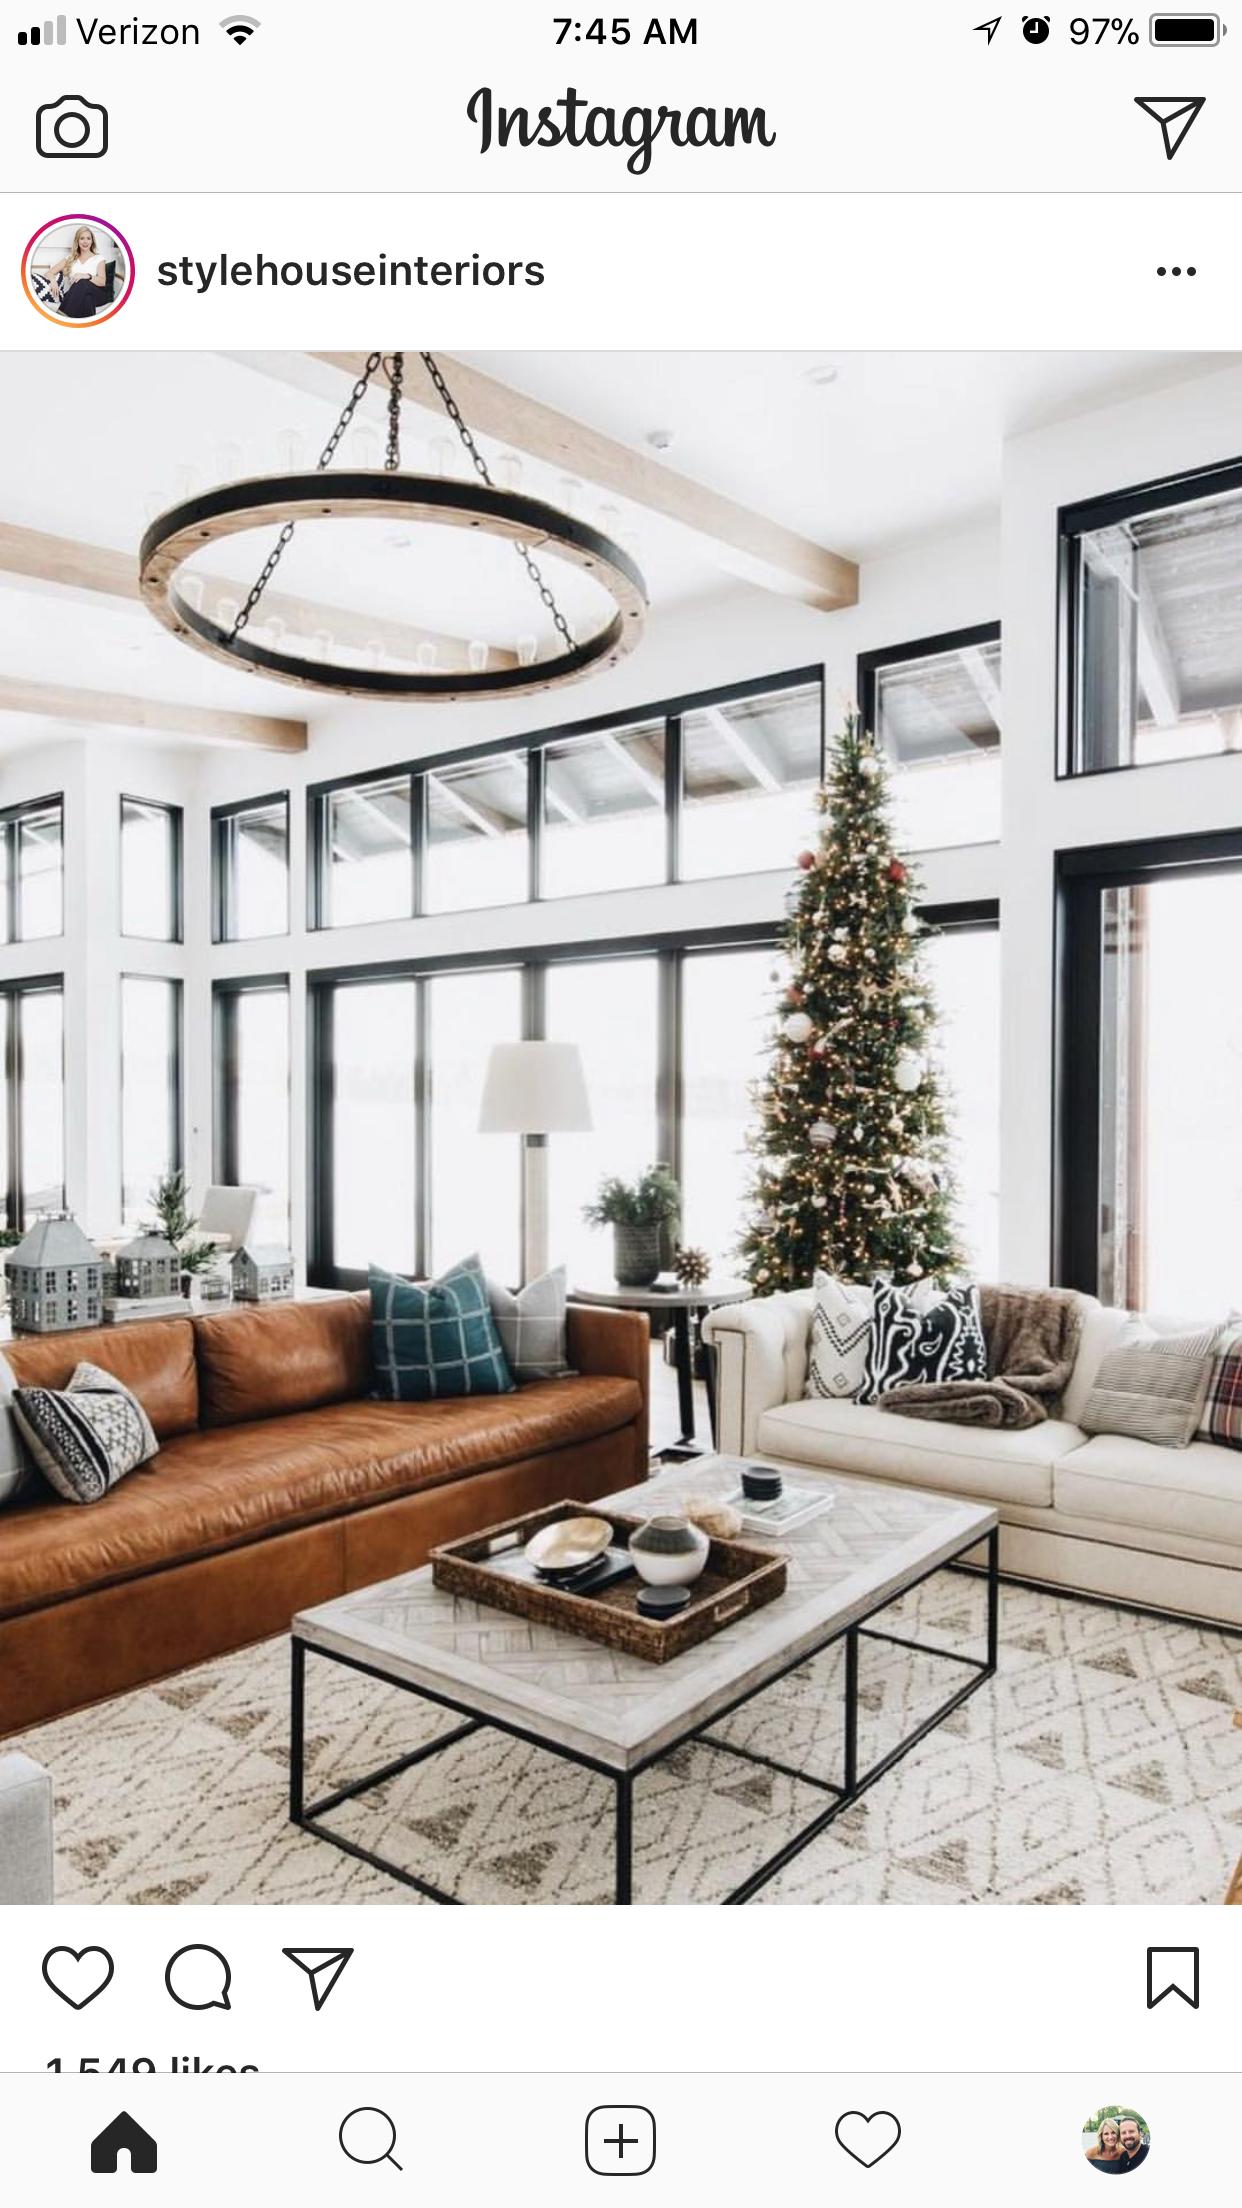 Pin by Allison Krill on Interior Design - Living Room | Pinterest ...